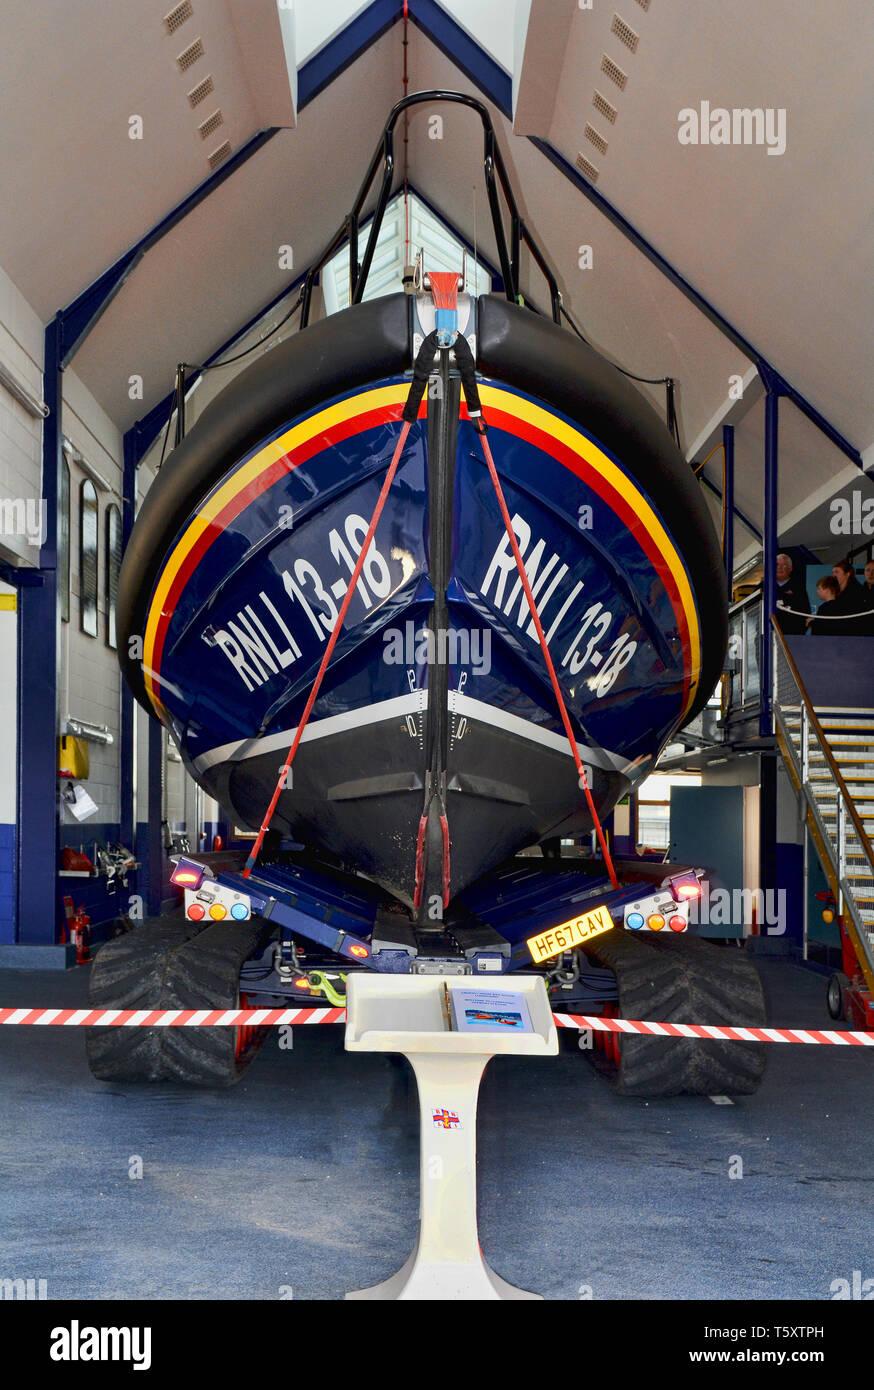 The new Llandudno Lifeboat station - Stock Image